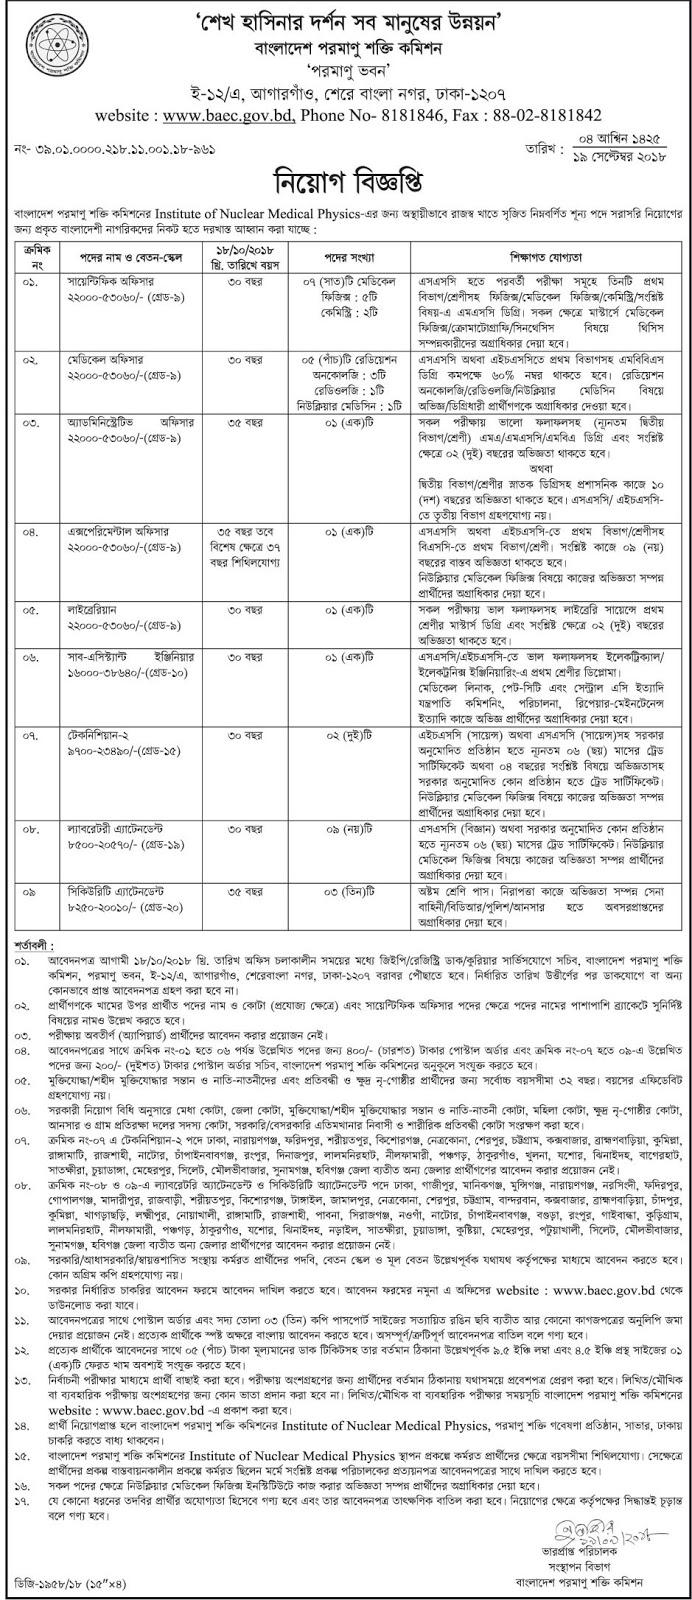 Bangladesh Atomic Energy Commission (BAEC) Job Circular 2018